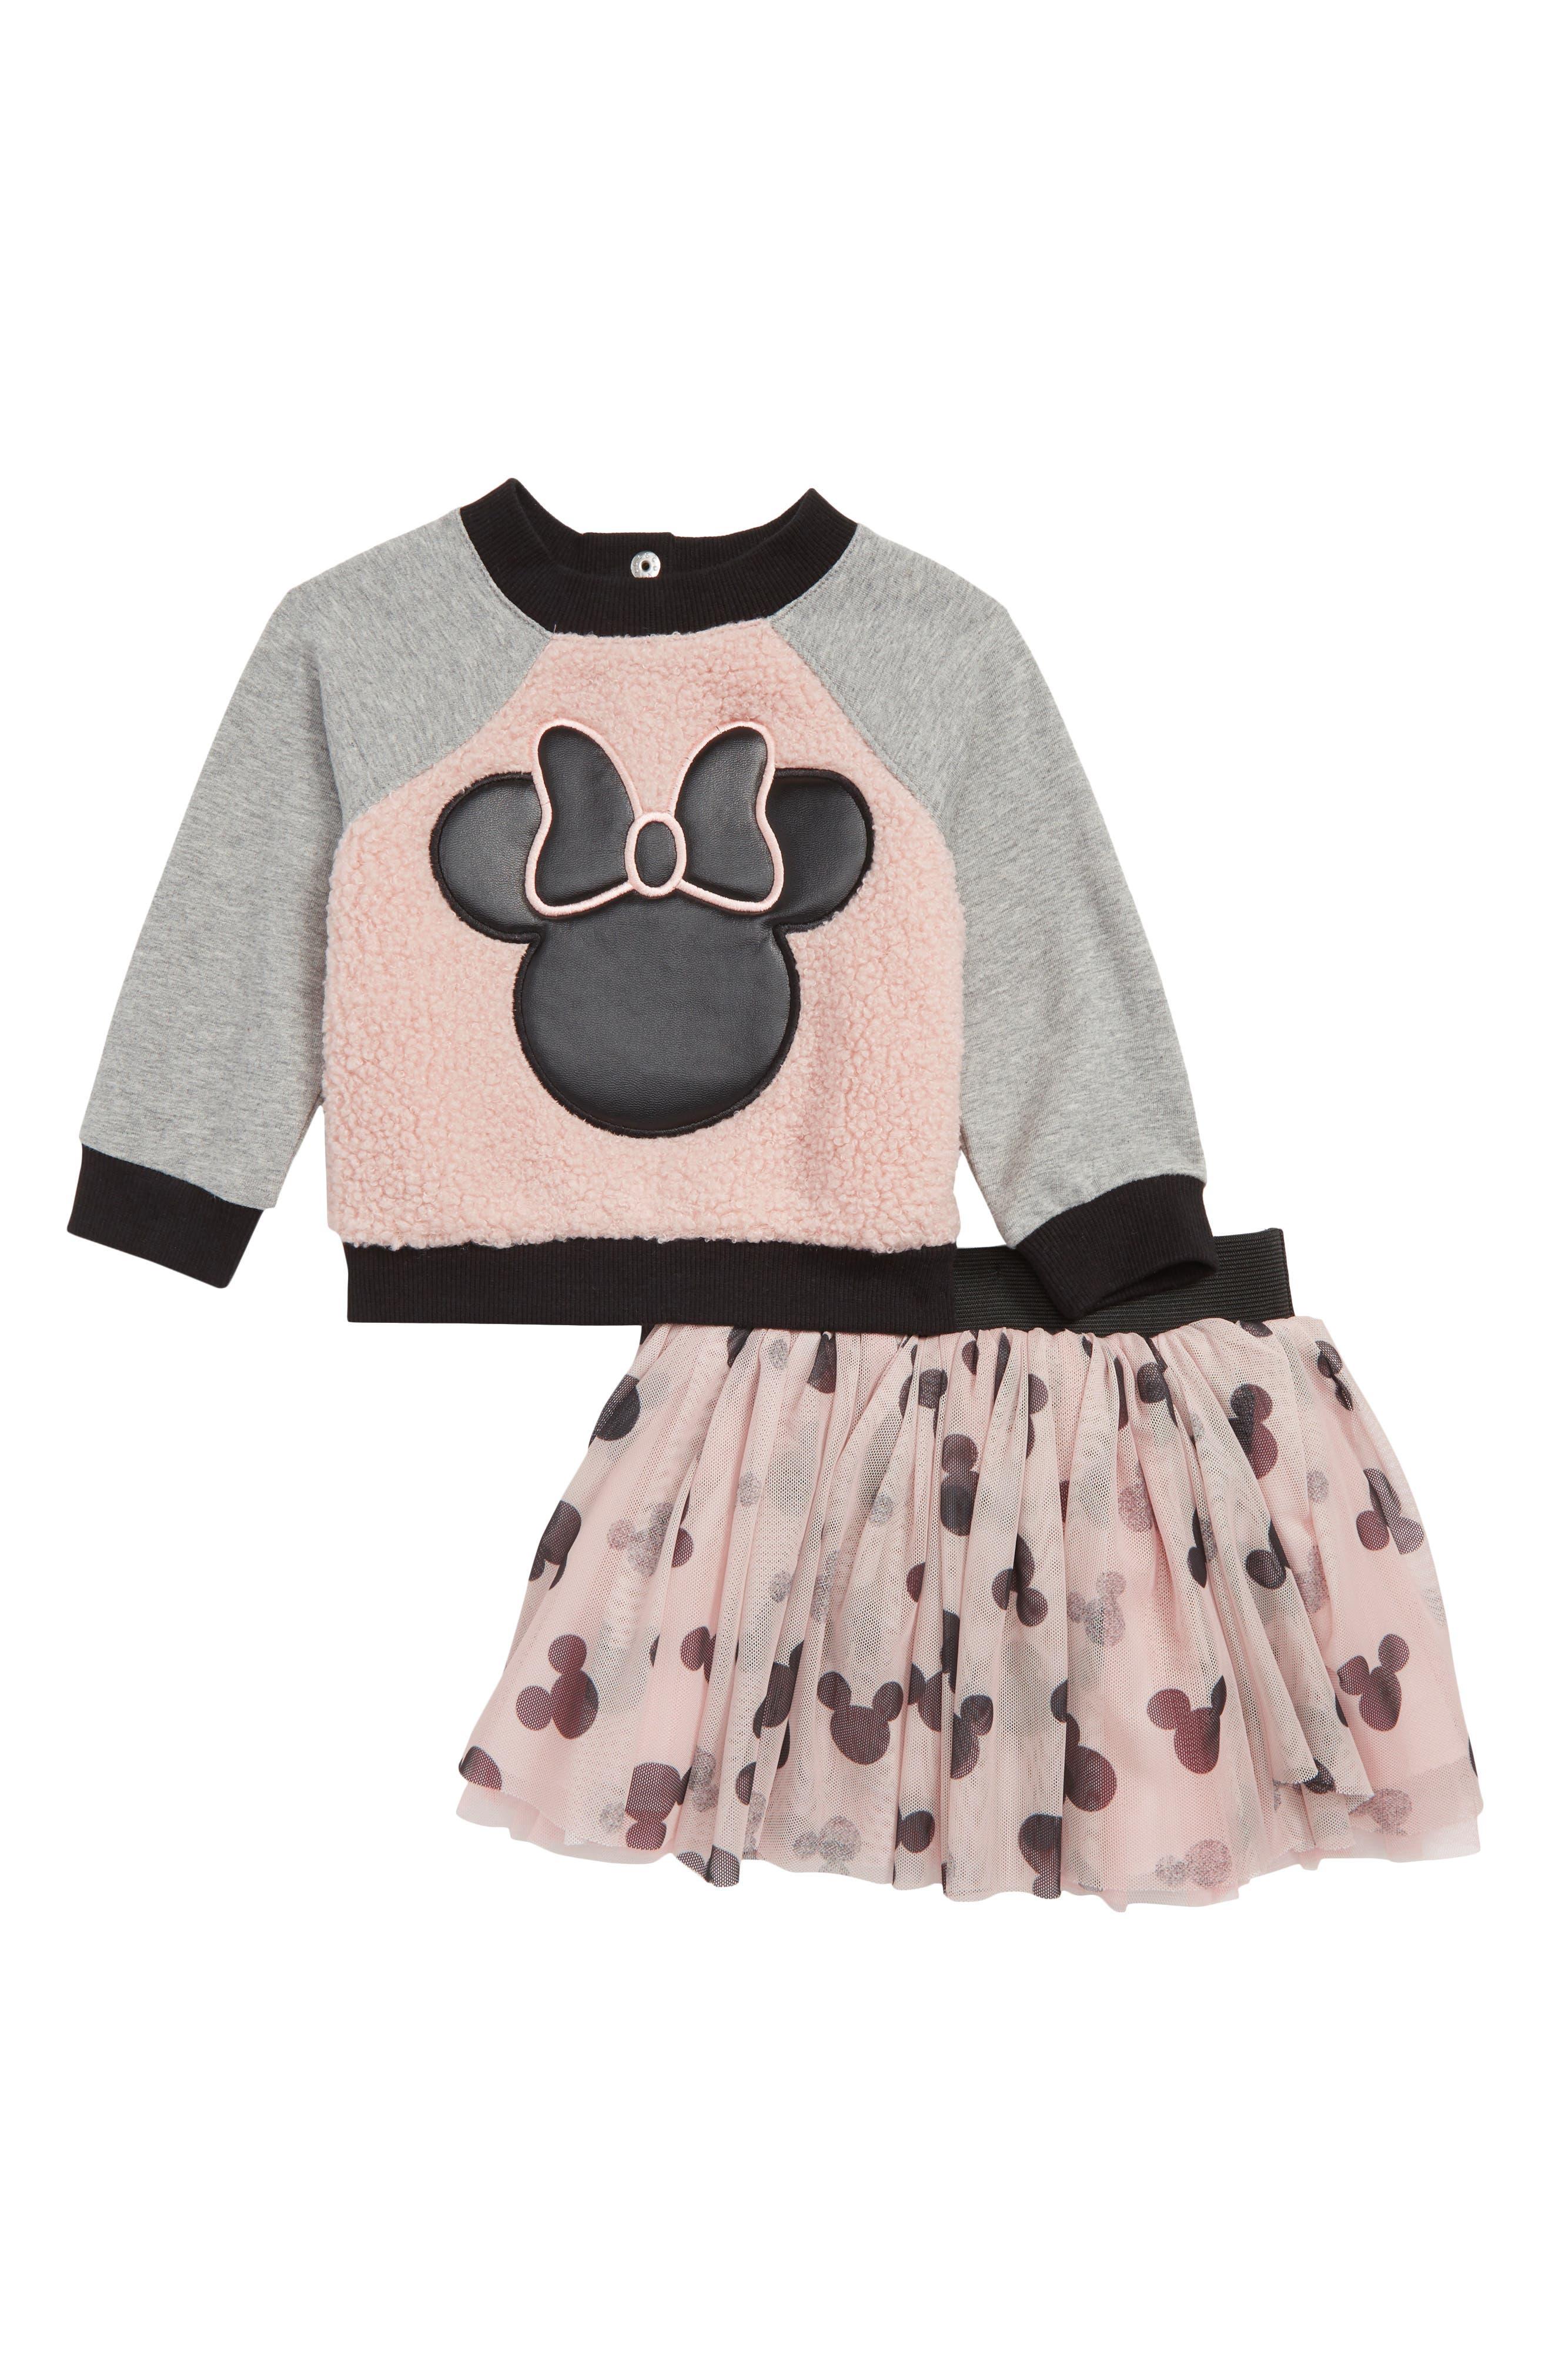 x Disney Minnie Mouse Pullover & Tutu Skirt Set,                         Main,                         color, PINK/ GREY